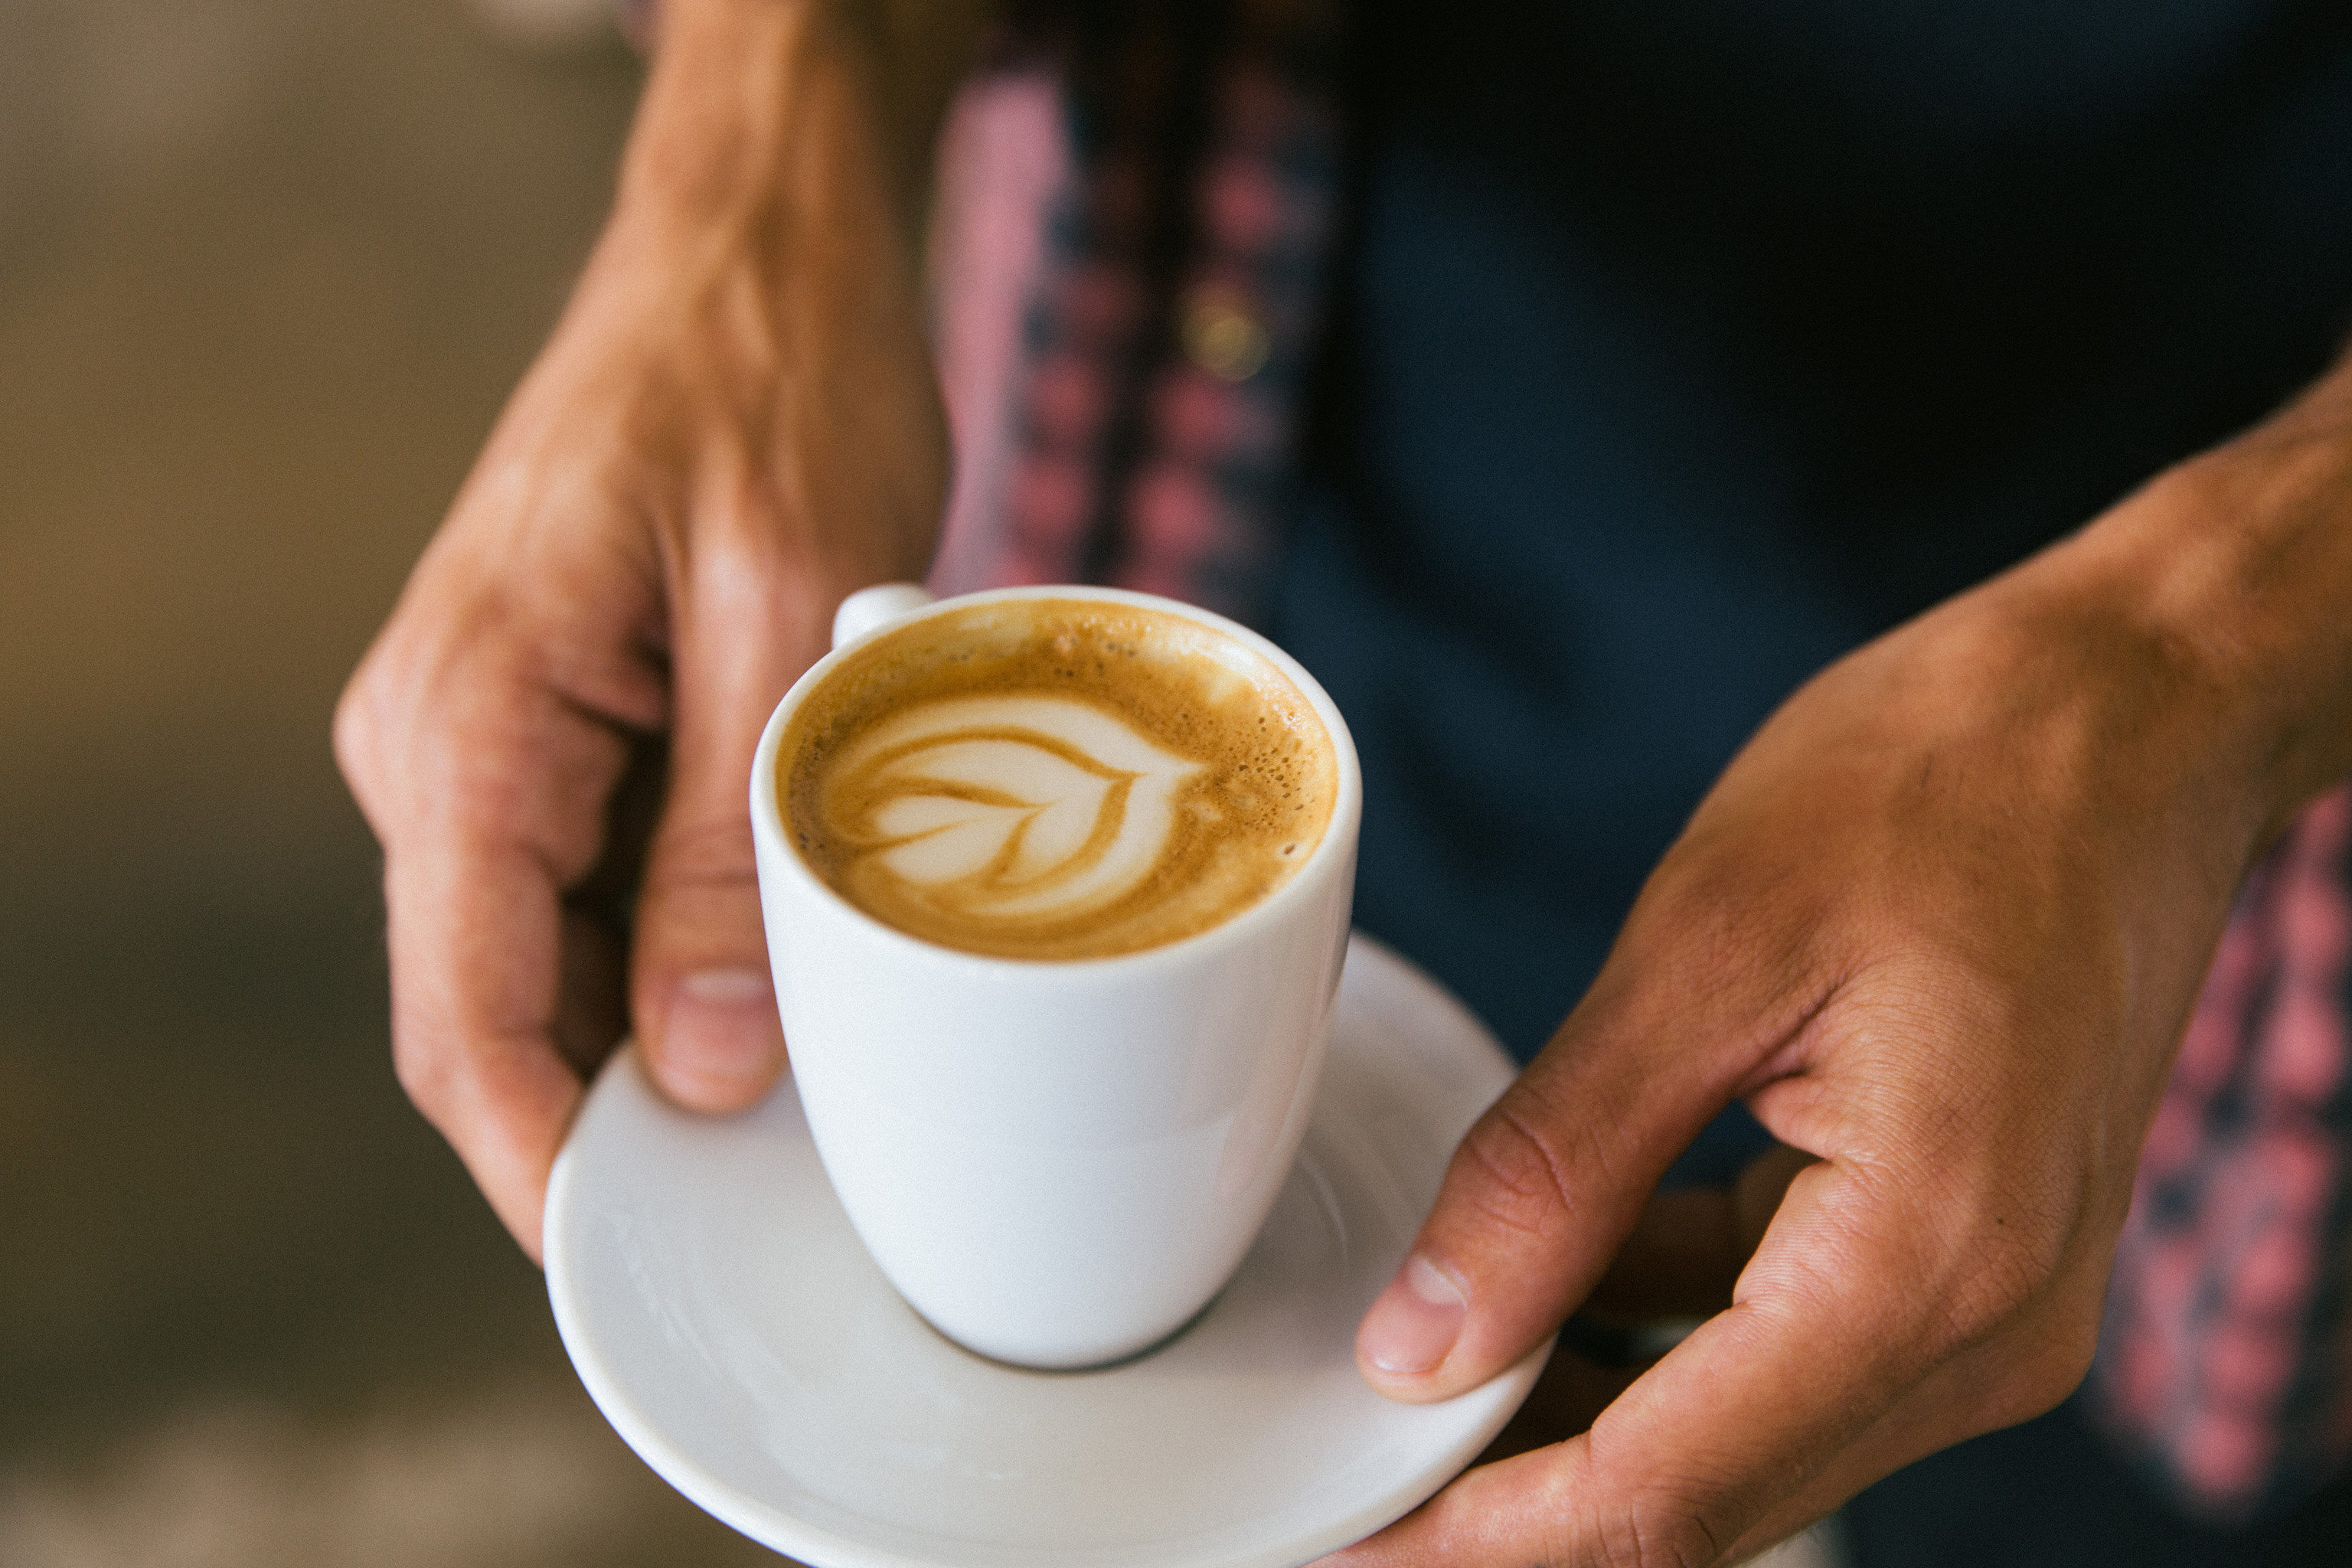 Jetsetter Guides cup coffee person Drink beverage indoor food latte caffeine espresso sense flavor breakfast coffee cup